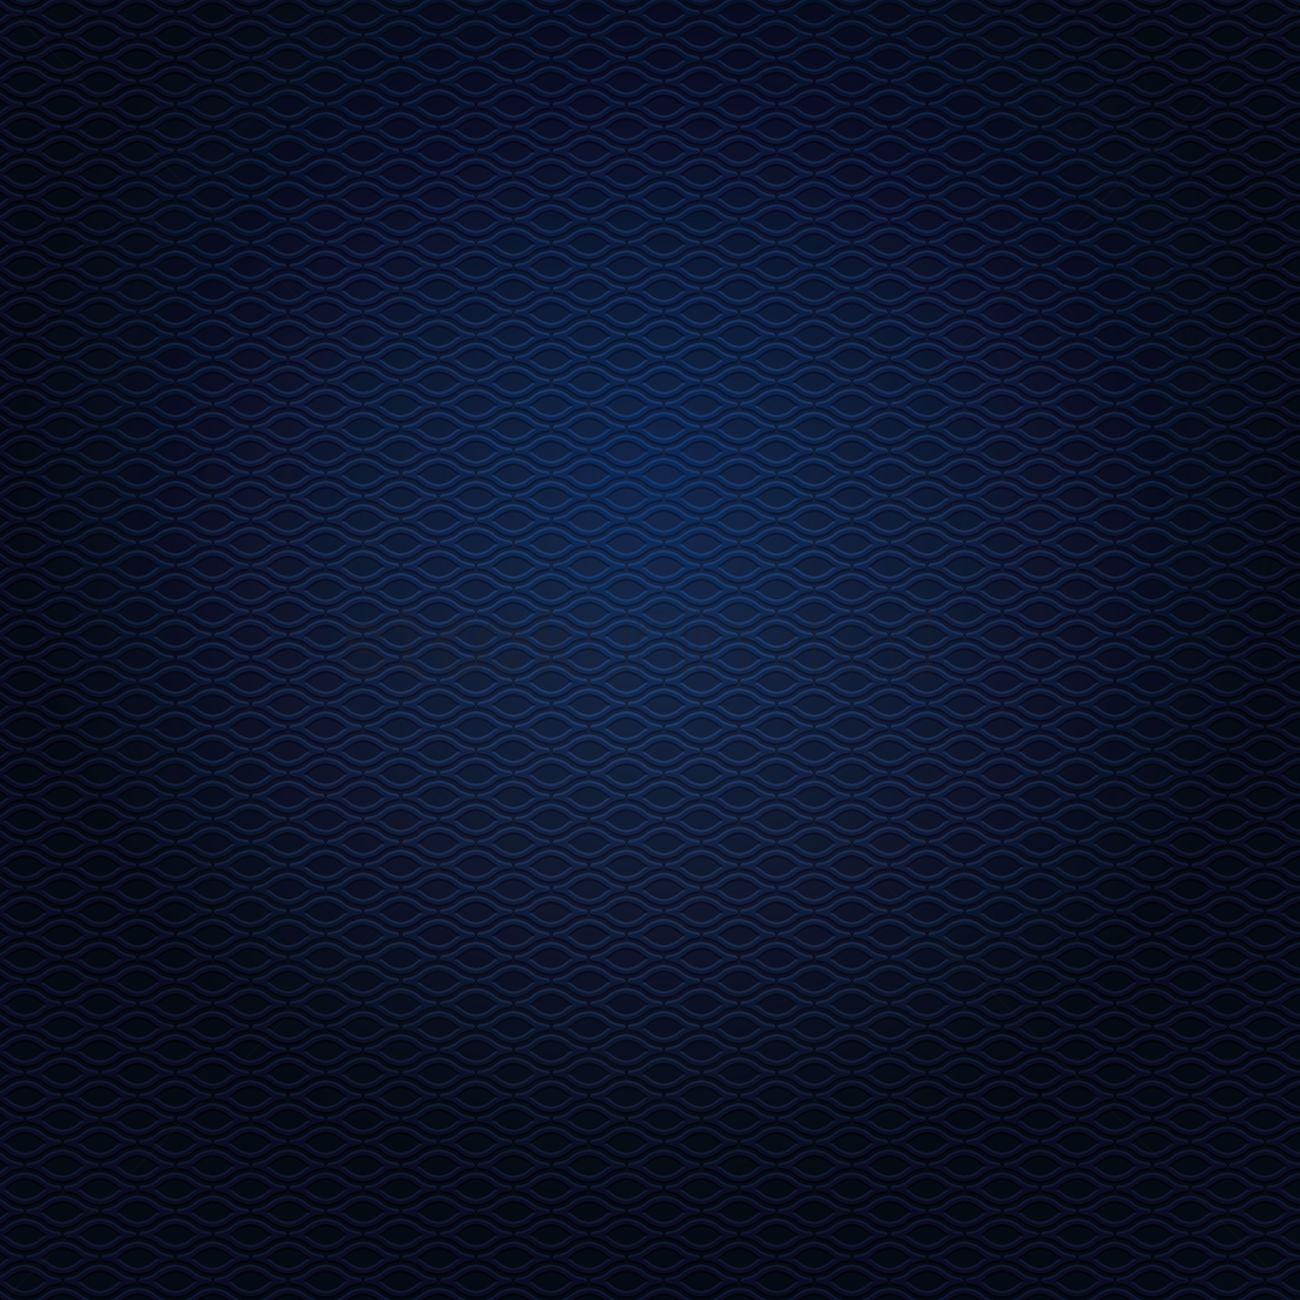 Dark blue textured background Vector Image - 1845103 | StockUnlimited